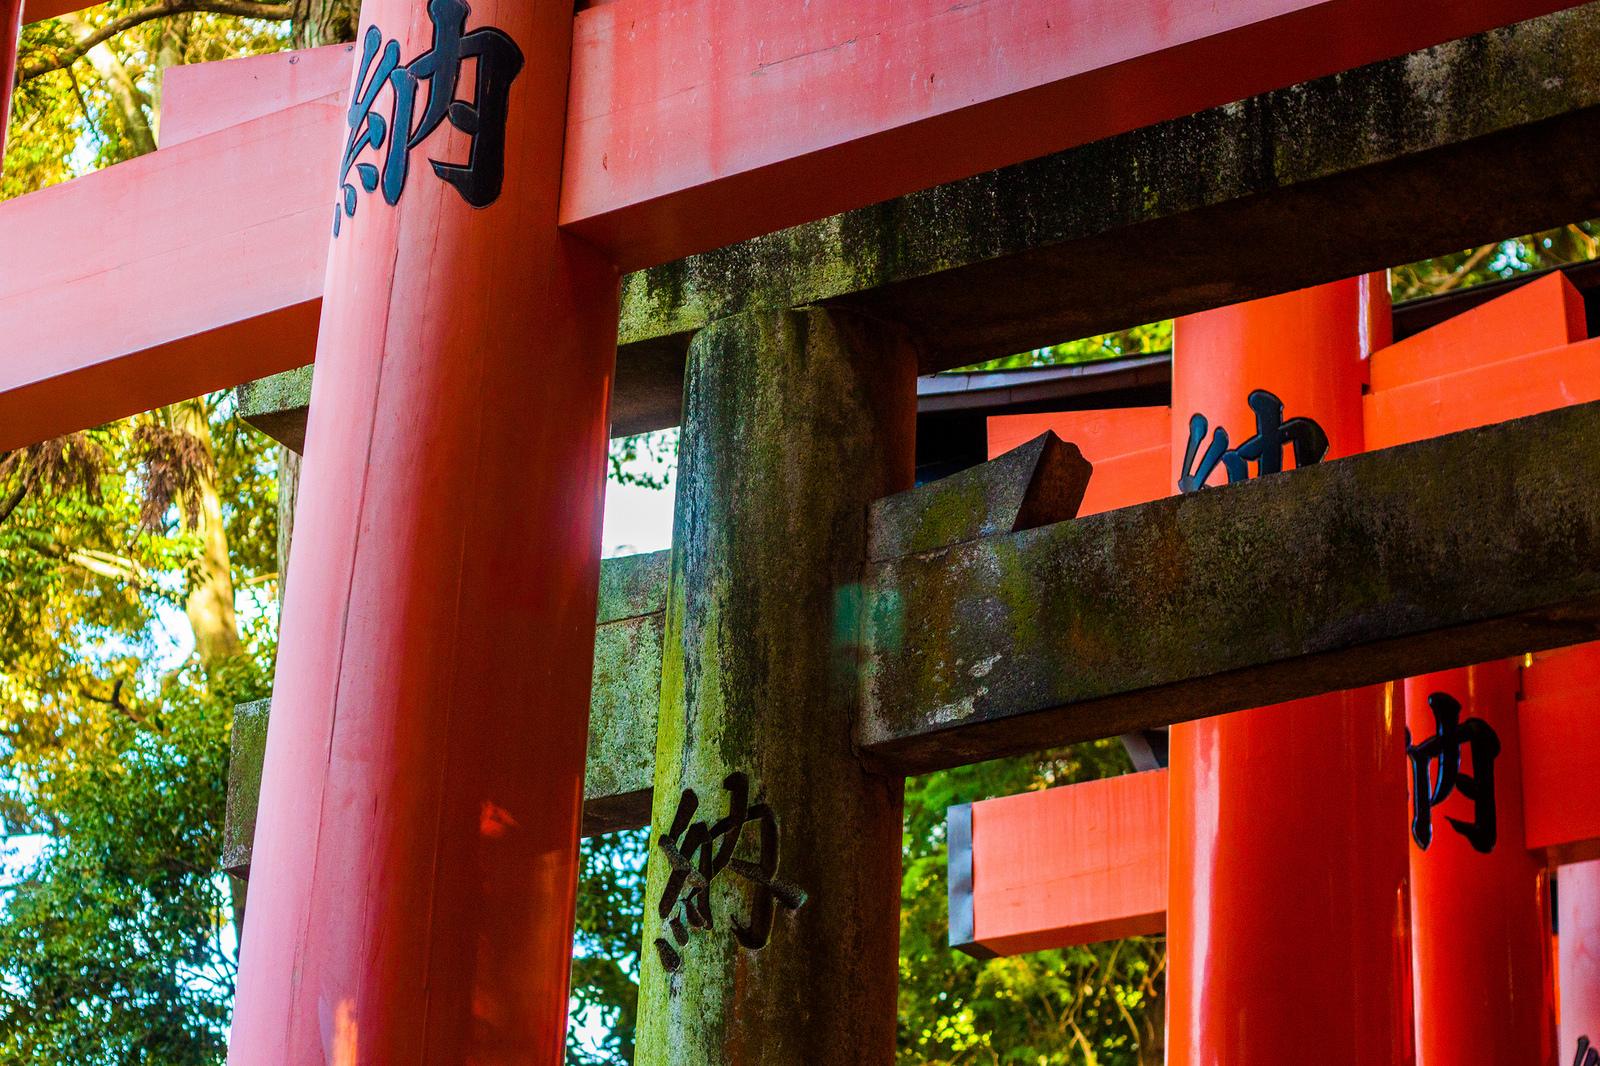 30371684505_a96335863c_h.jpgThe Ultimate Walking Tour of Kyoto's Incredible Fushimi Inari Shrine's 10,000 torii gates